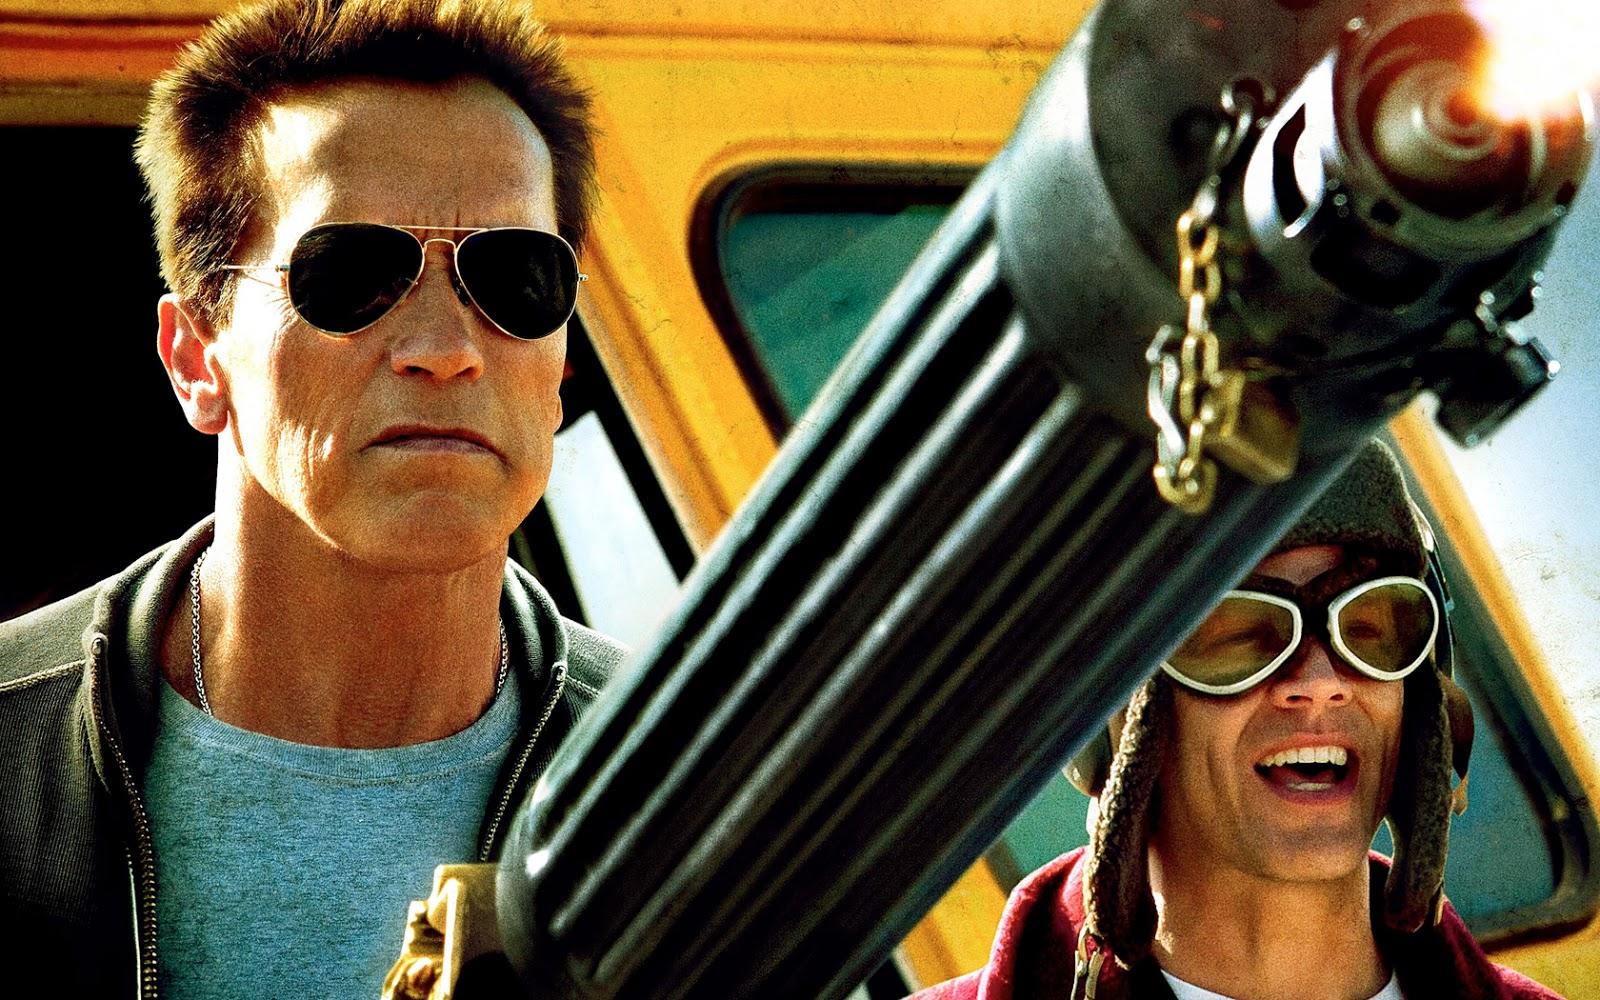 Arnold-Schwarzenegger-Machine-Gun-Last-S